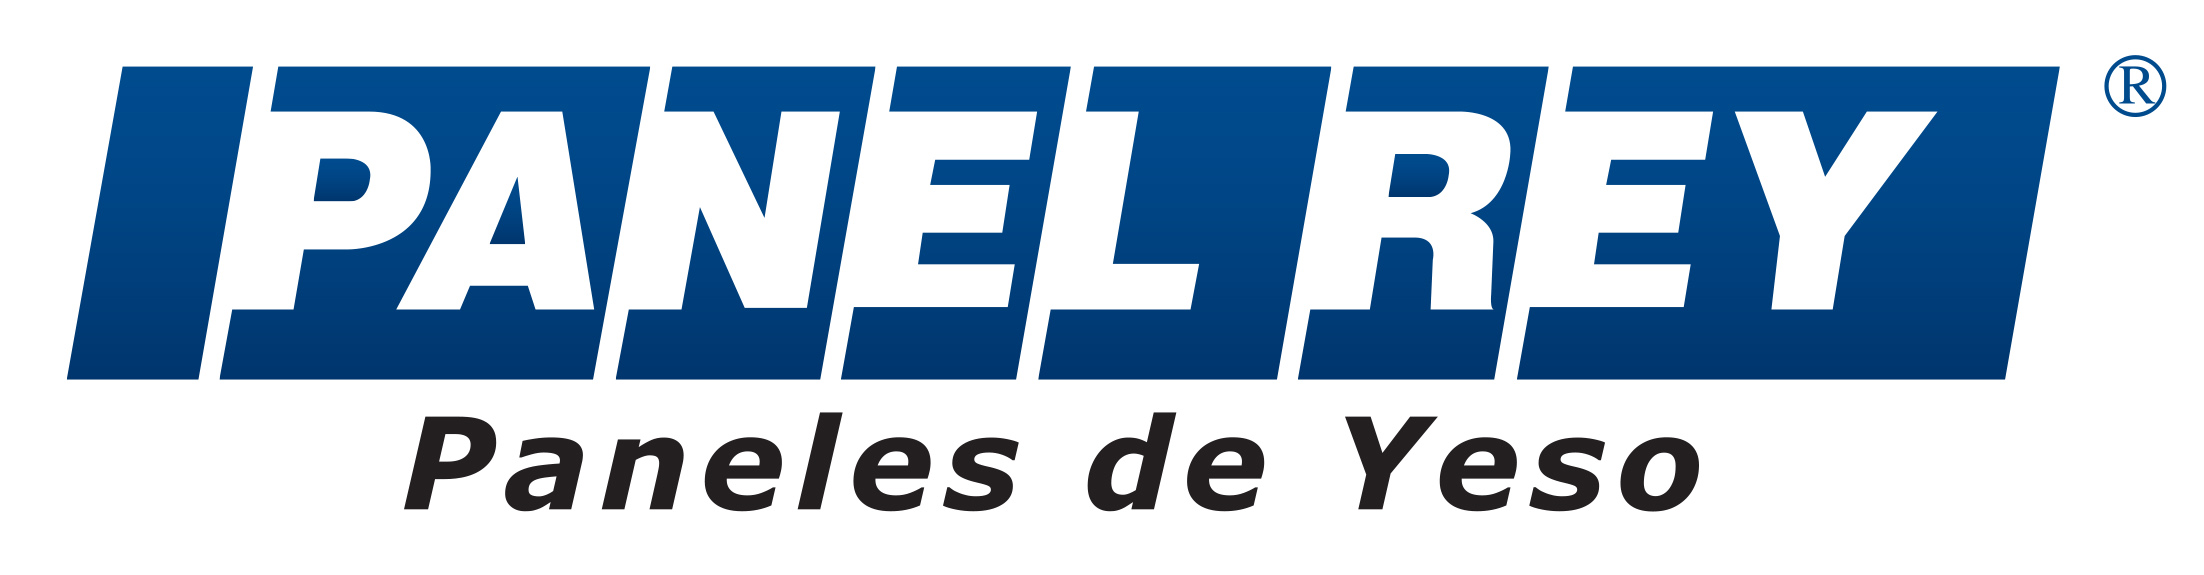 Panel Rey Logo photo - 1